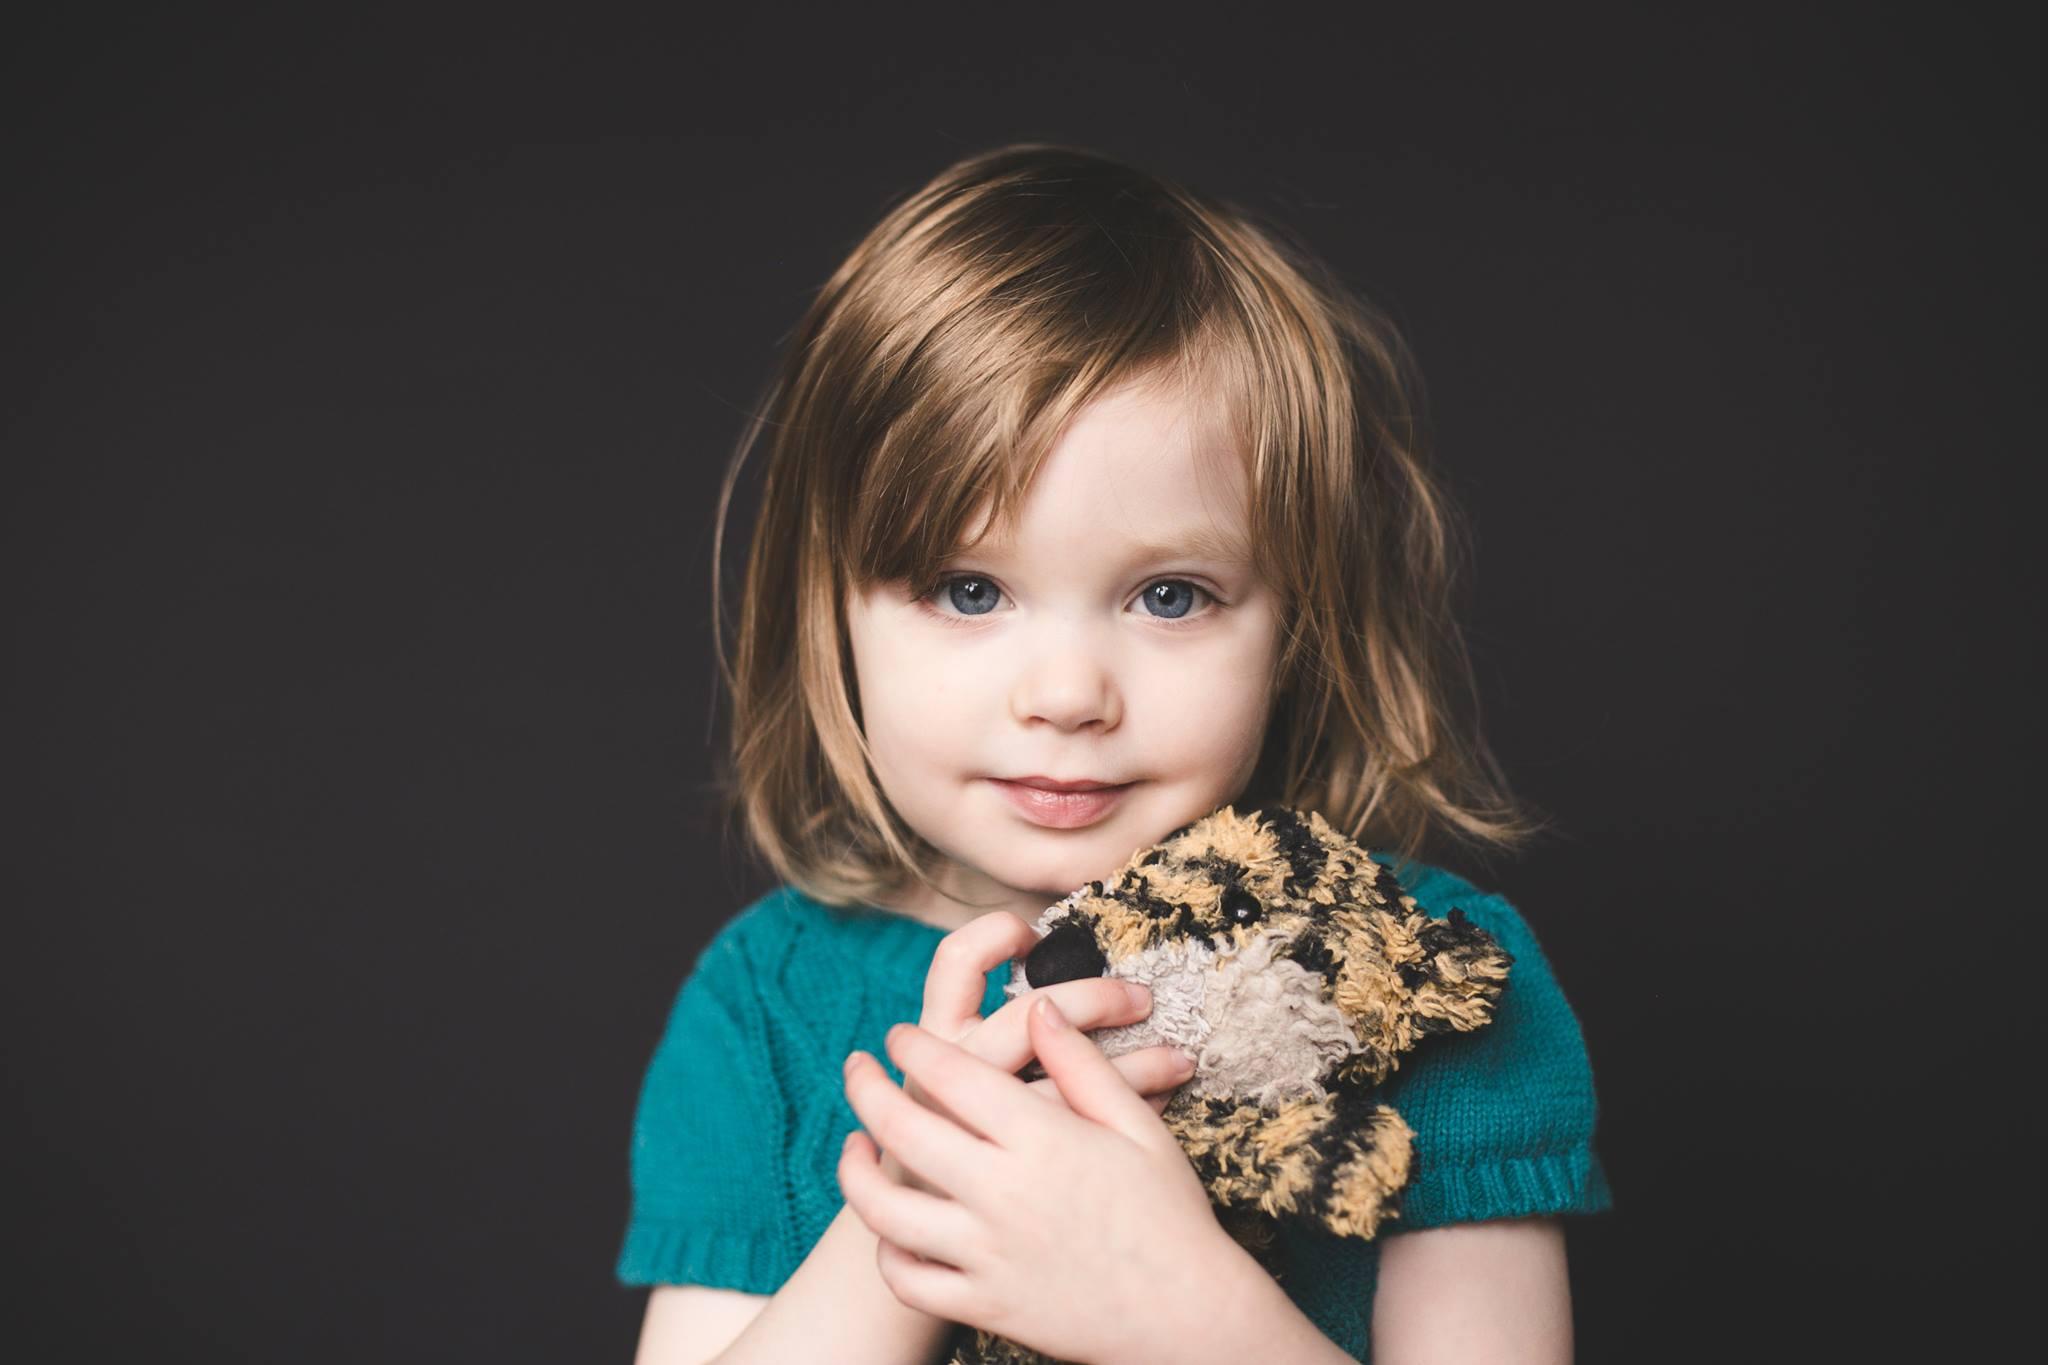 schooled online boutique school photography course by elena s blair | shannon garbaccio